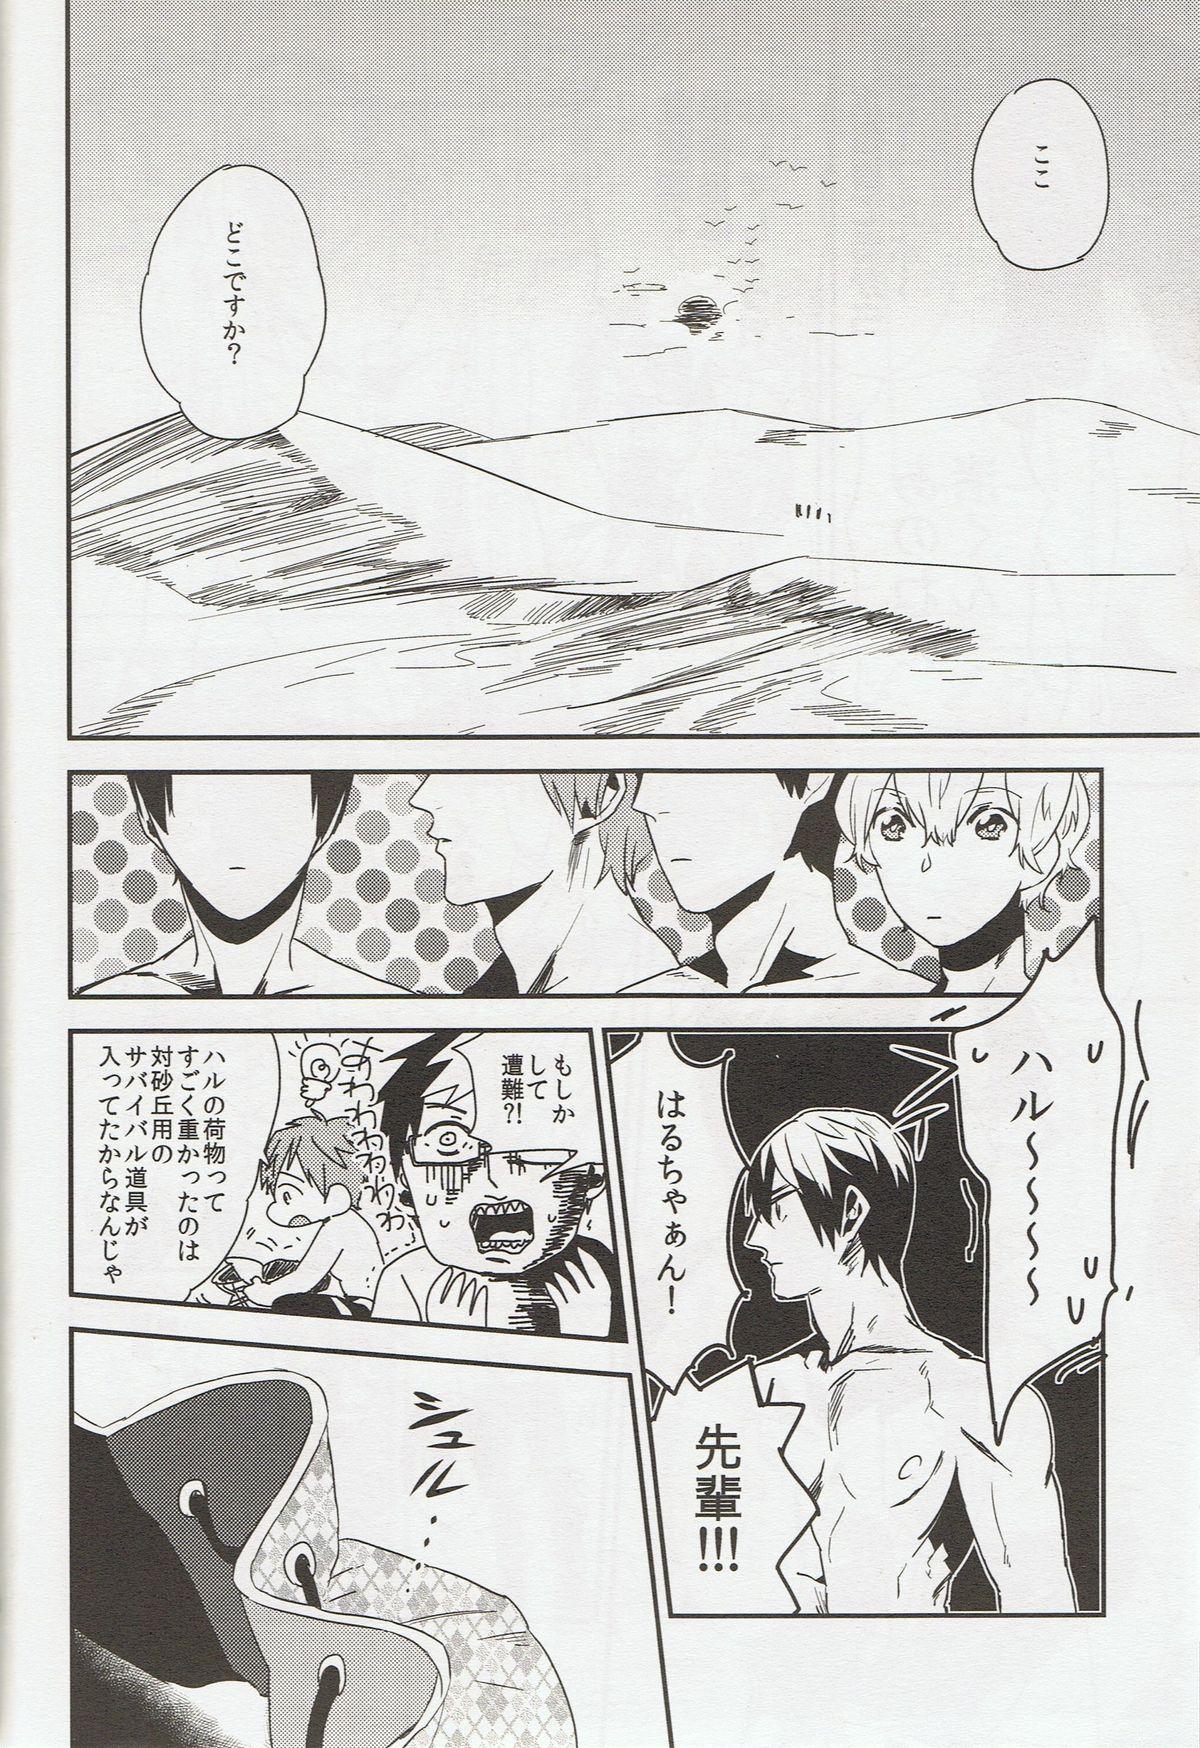 Sou da, Tottori Sakyuu Ikou. 36